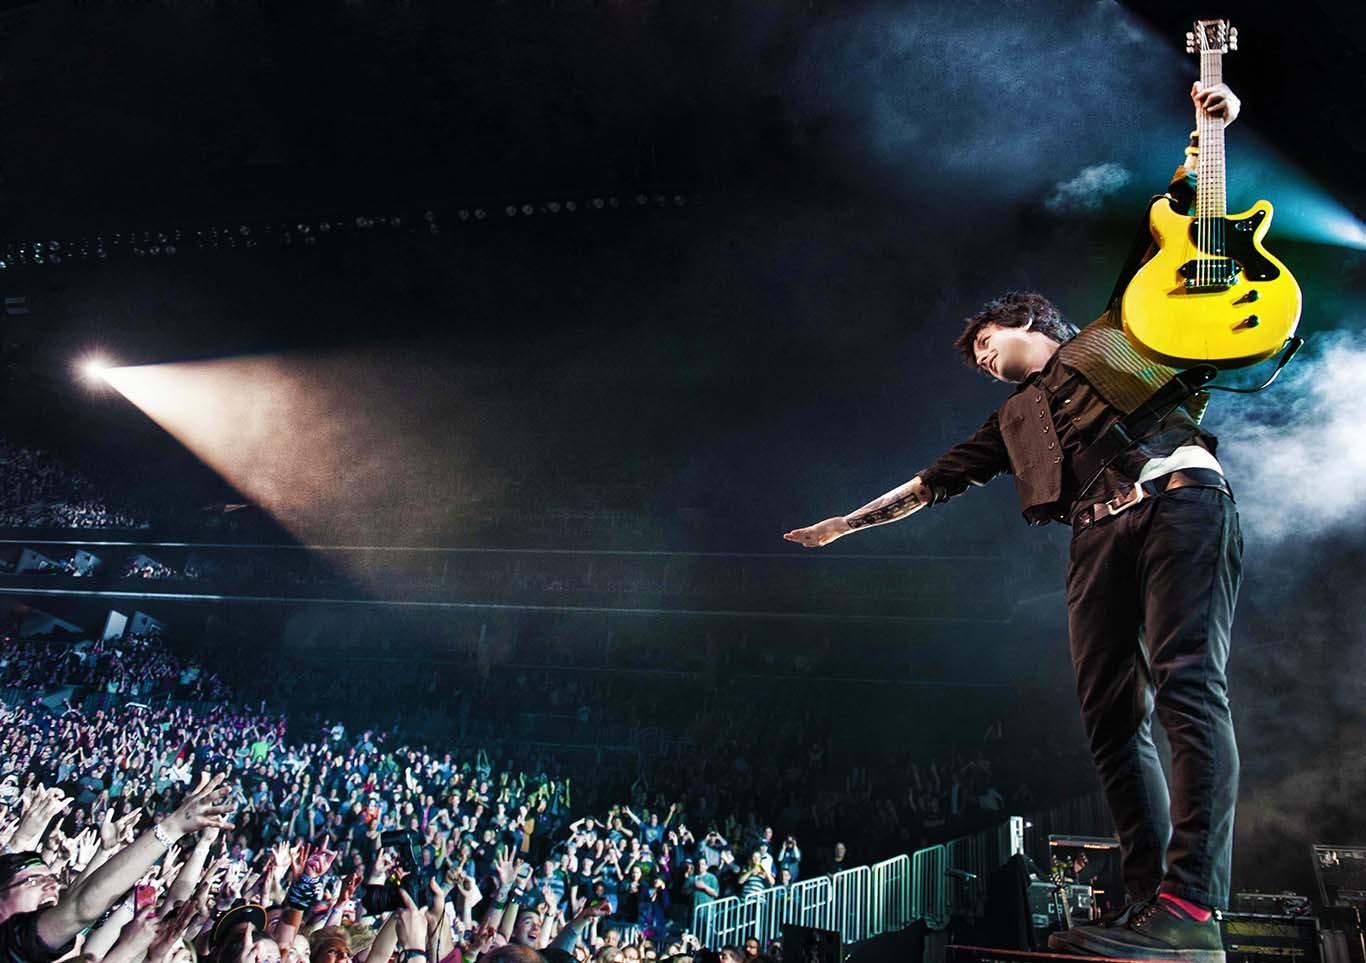 Billie Joe Armstrong of Green Day Dana Distortion